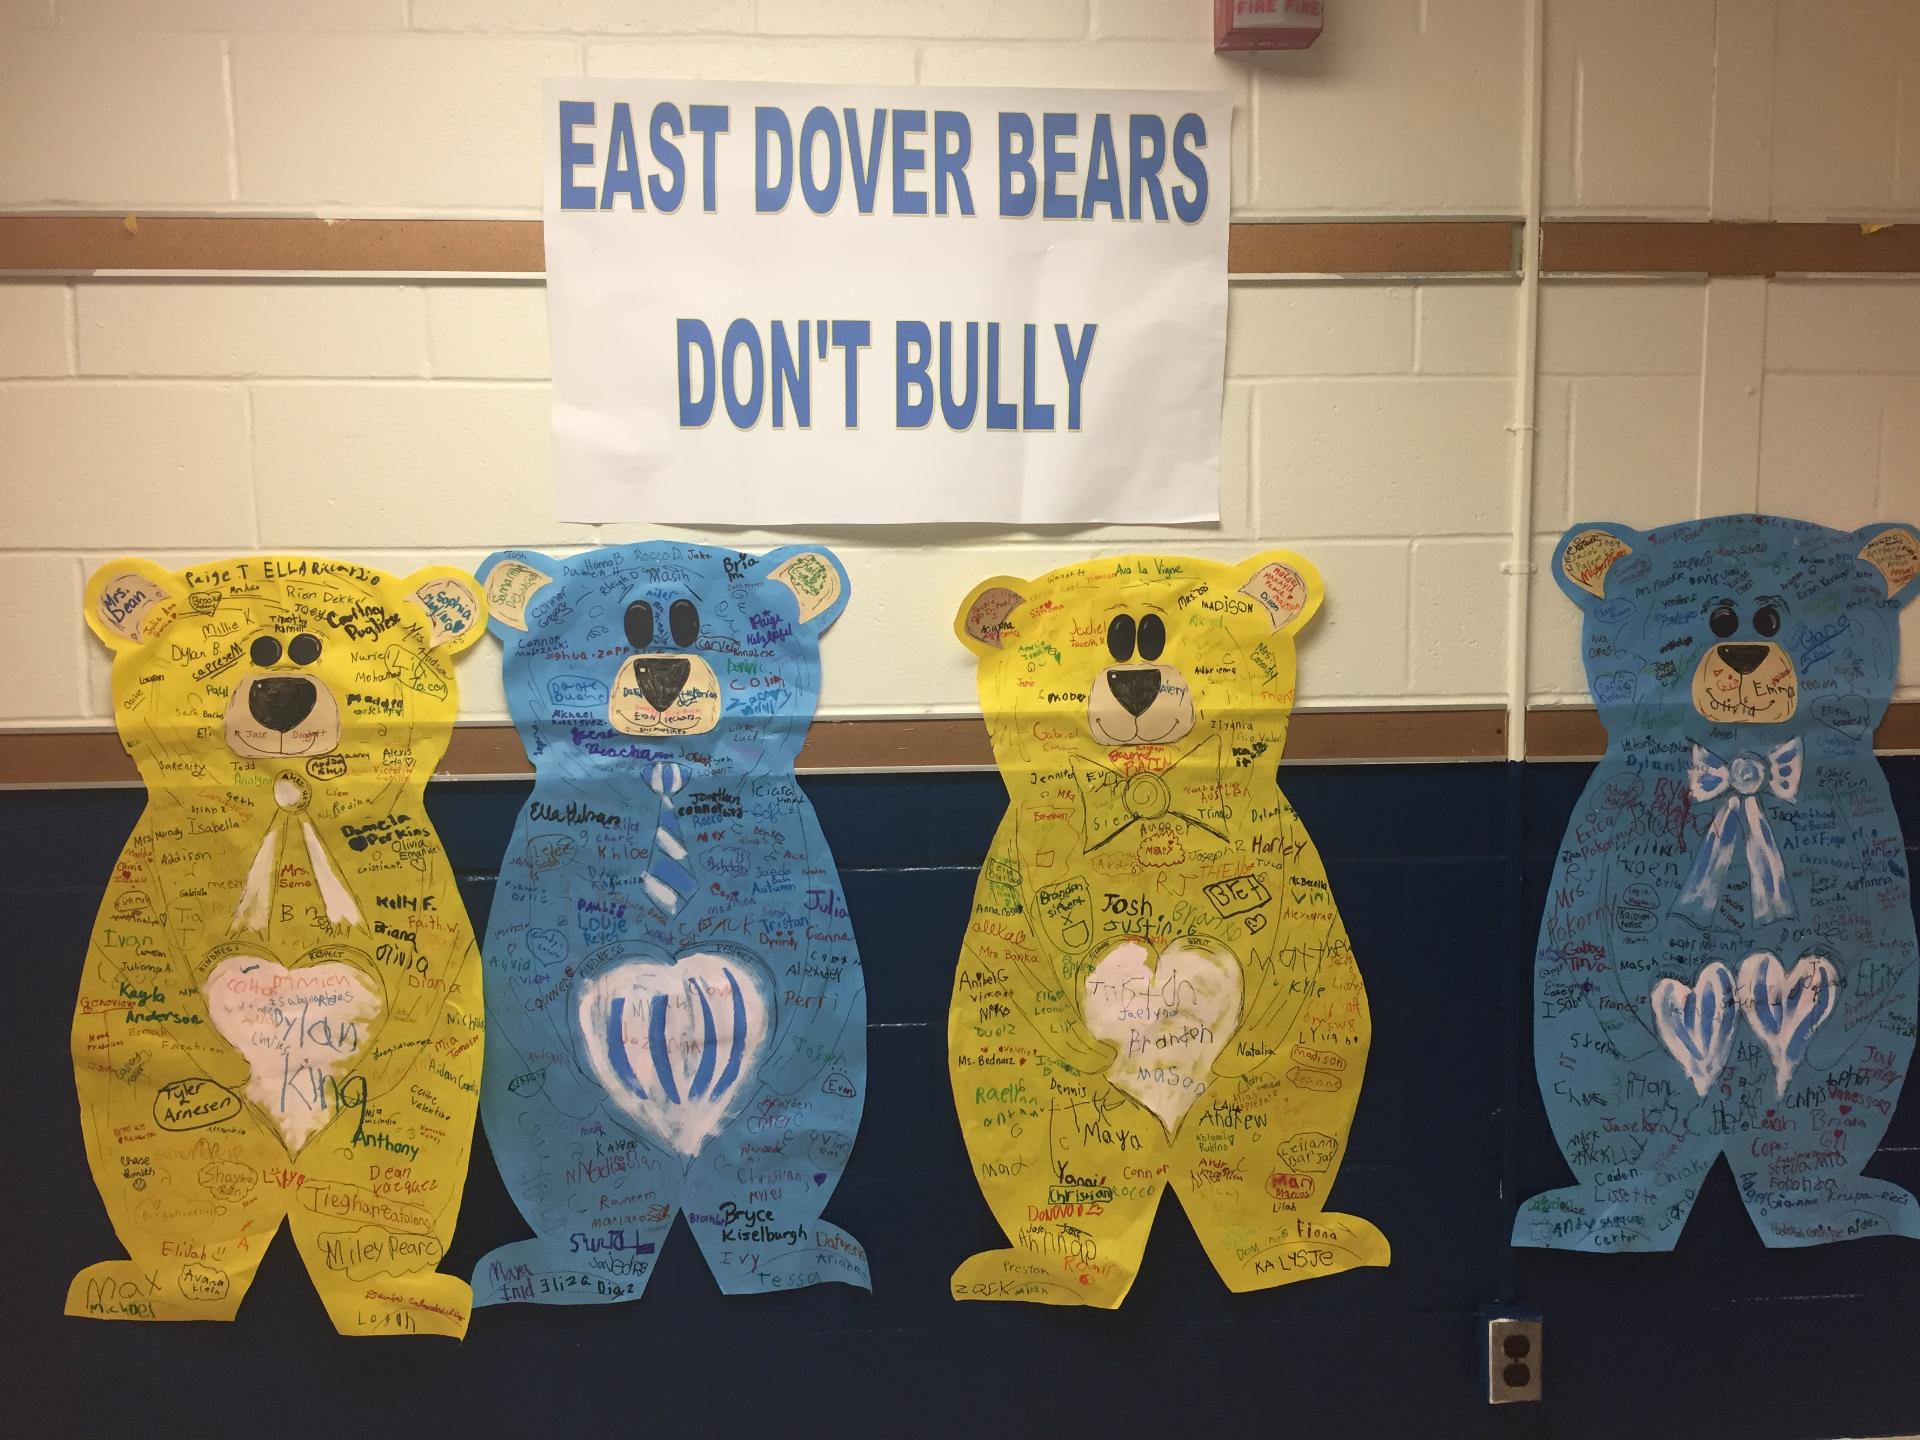 Bears Don't Bully